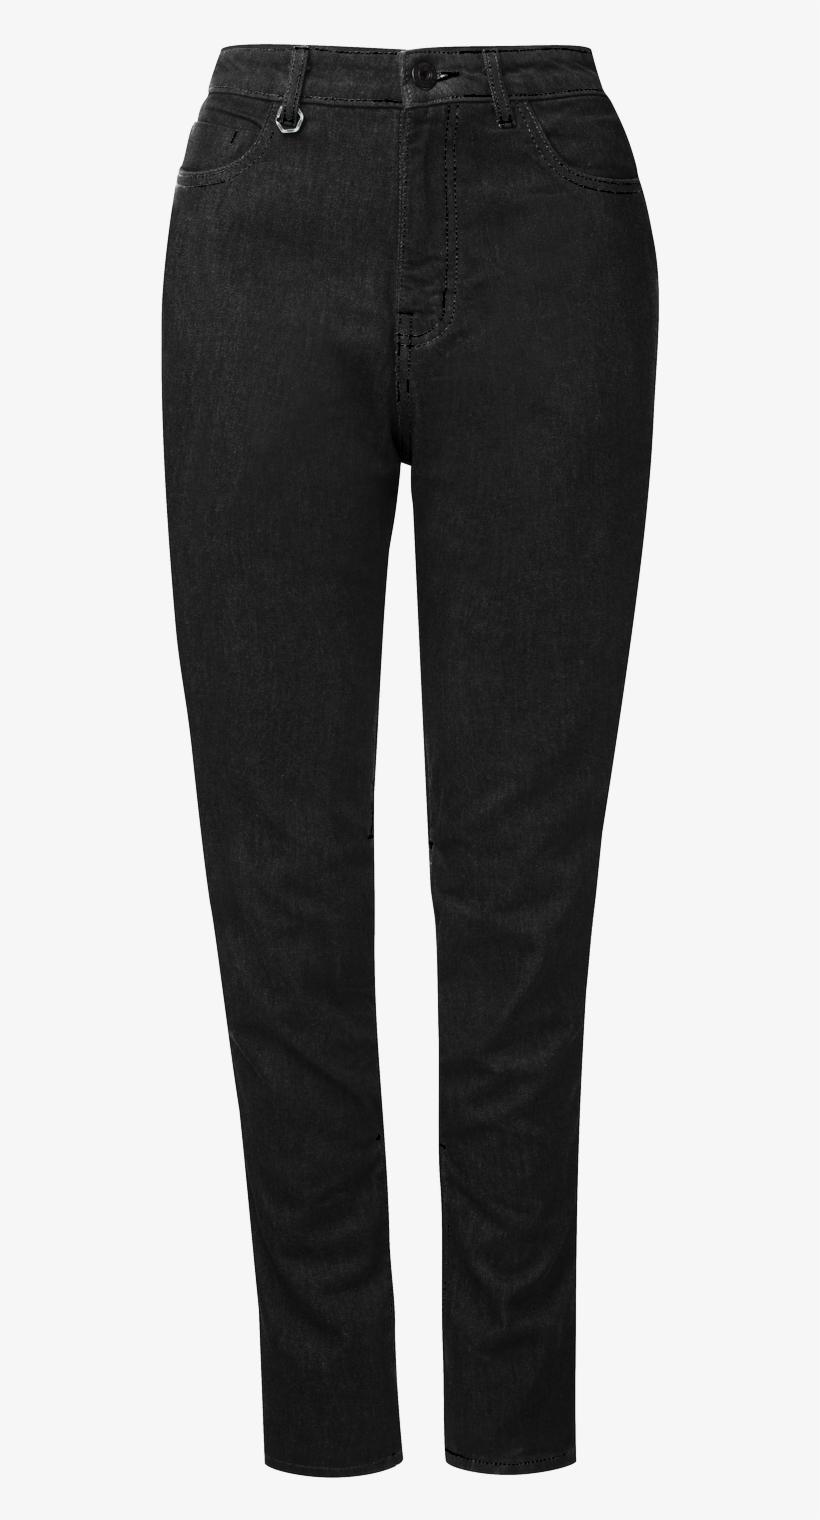 Transparent Black Jeans Png Transparent PNG.